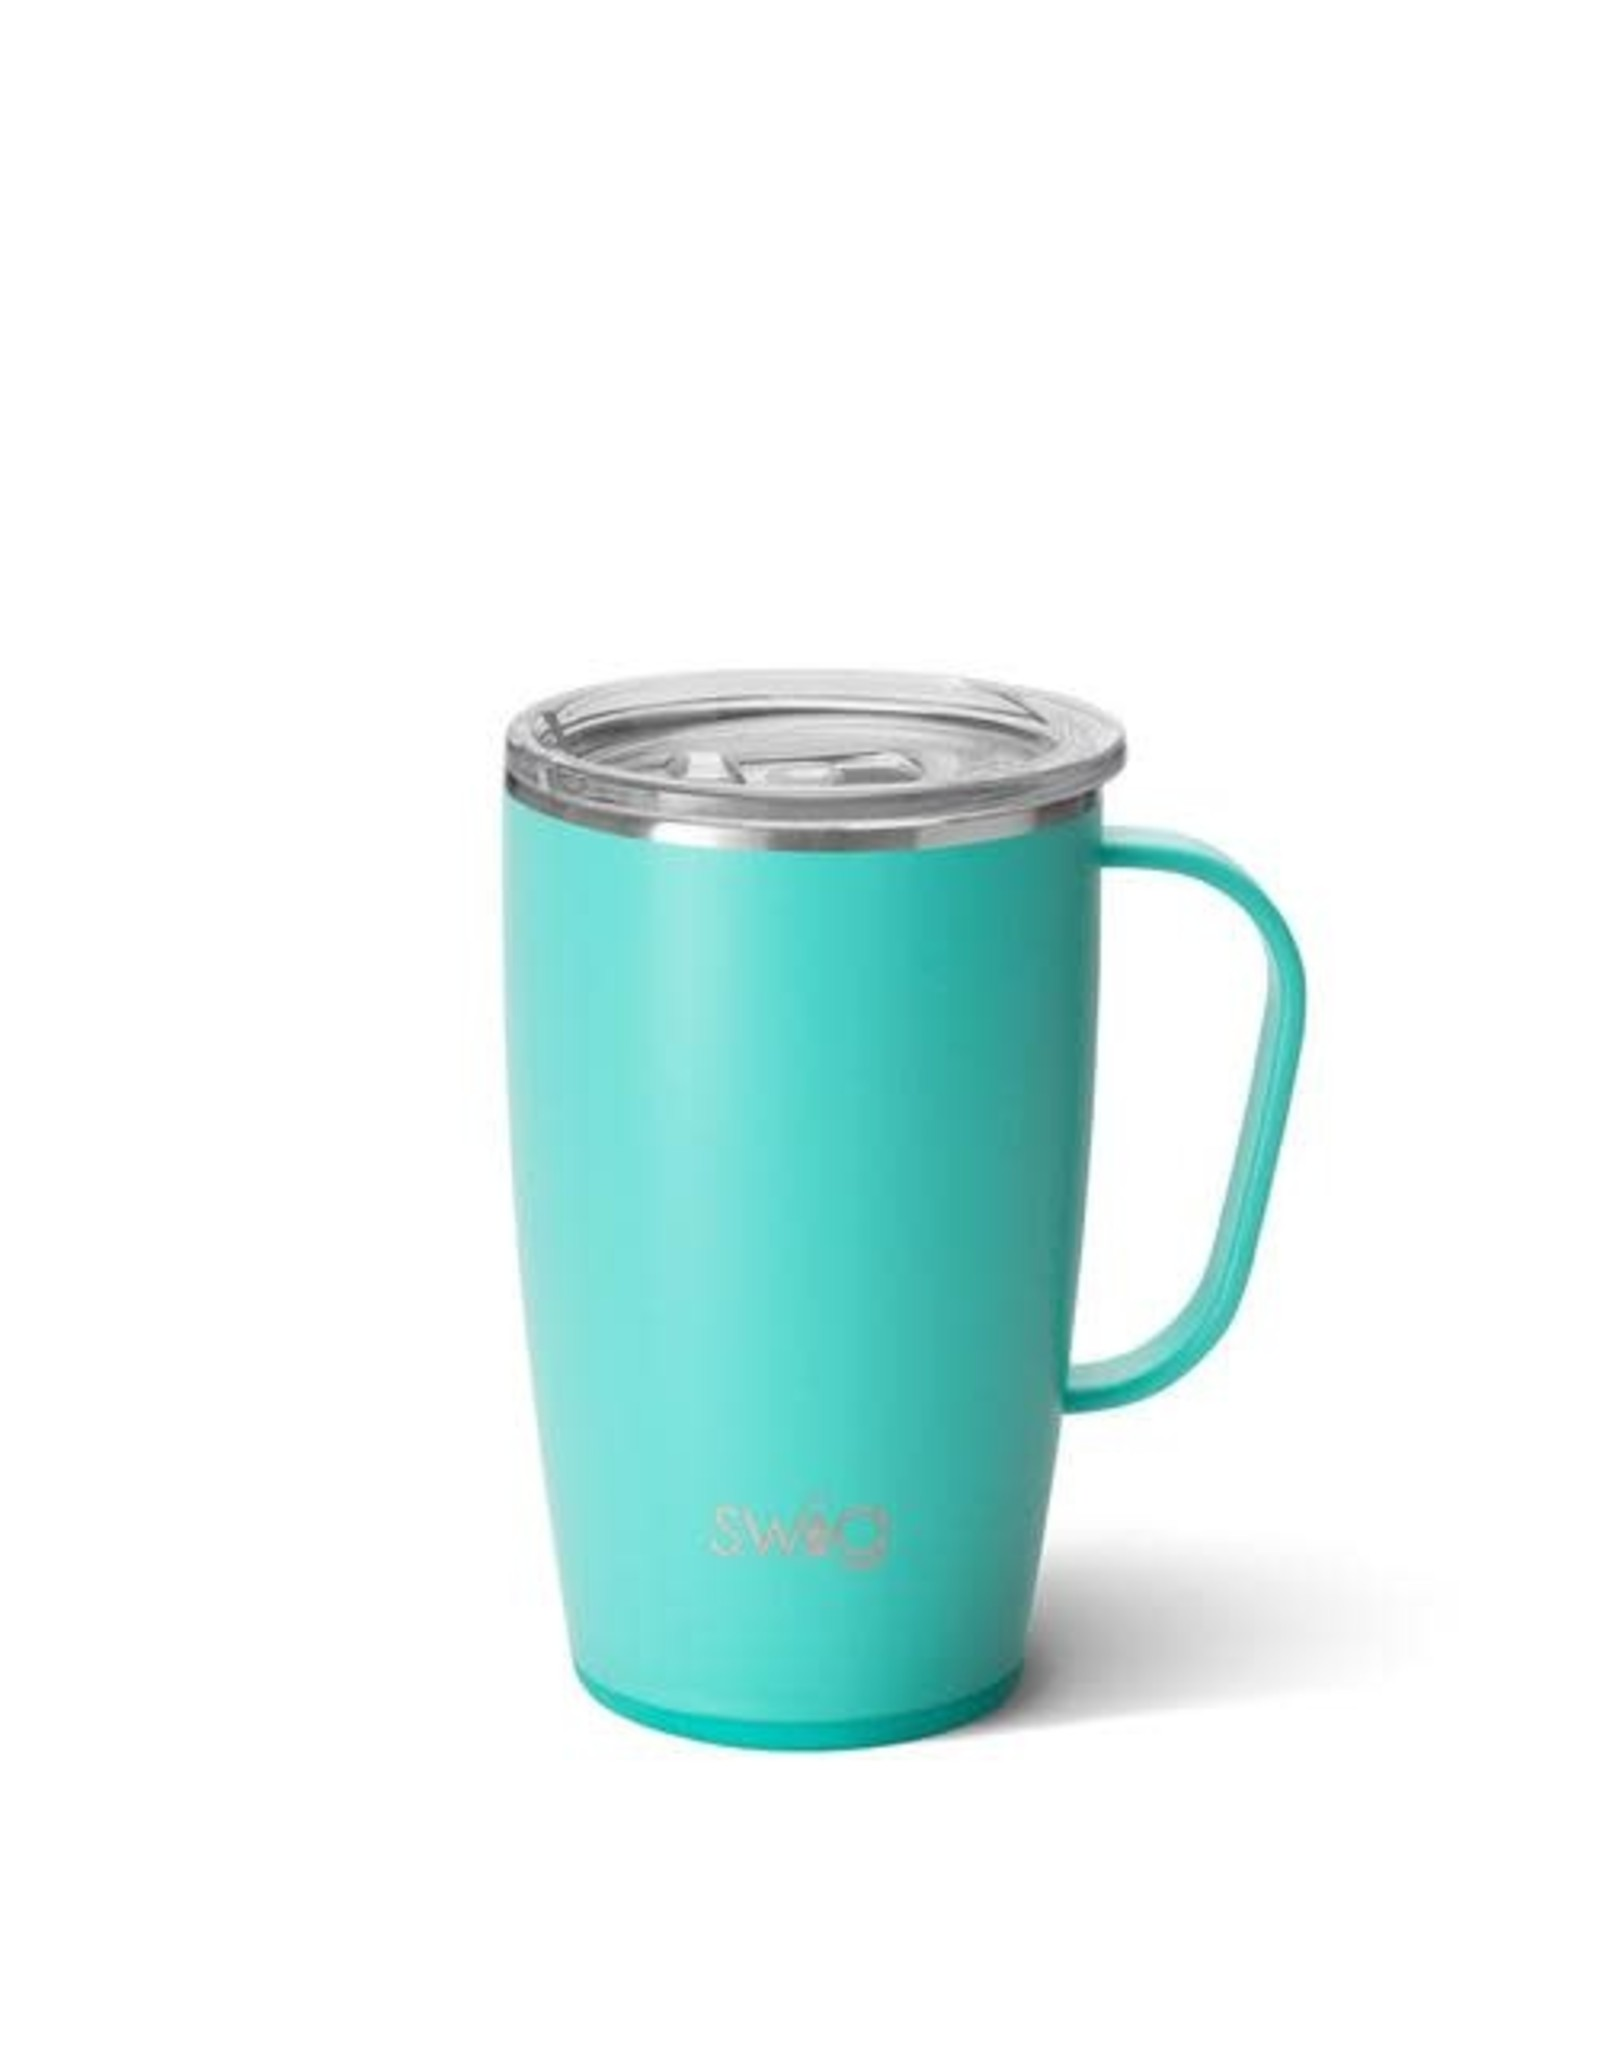 Swig 18 oz Mug - Matte Aqua